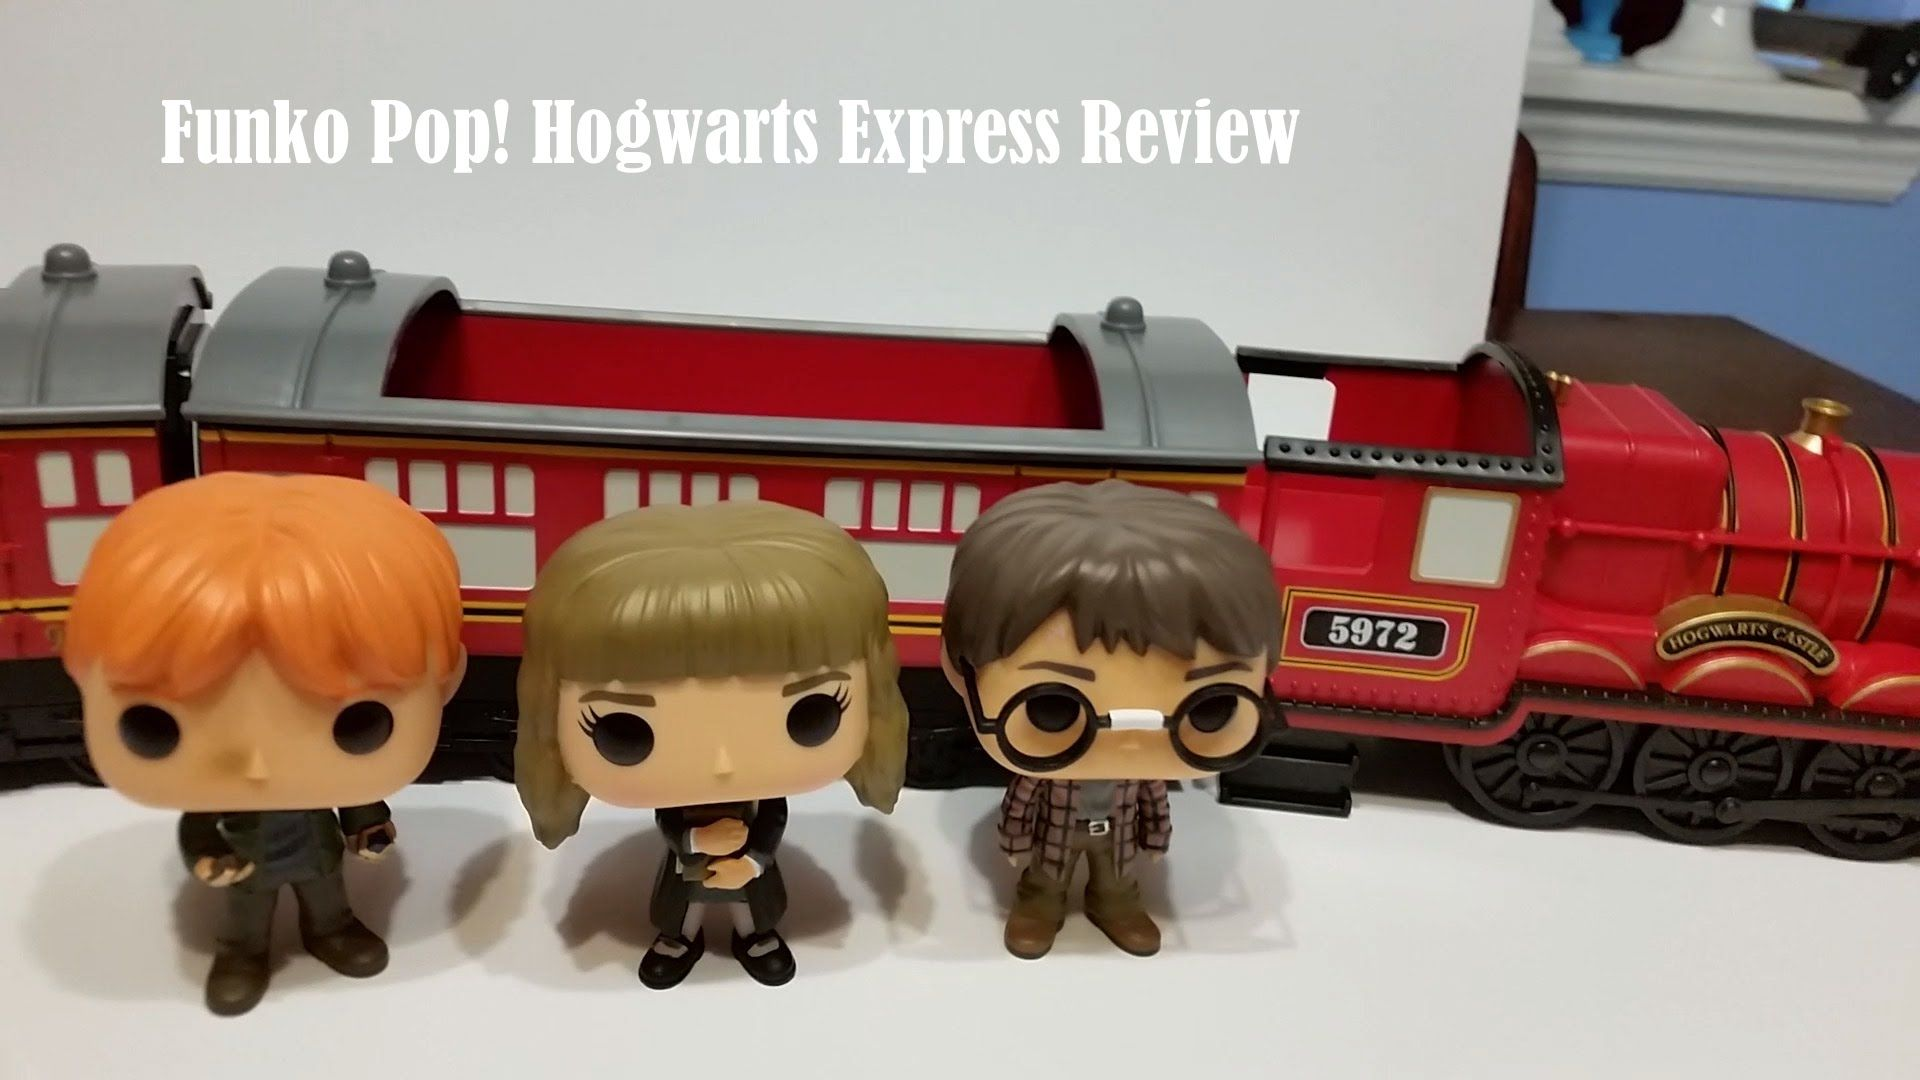 Funko Pop Harry Potter Hogwarts Express Train Full Set Review